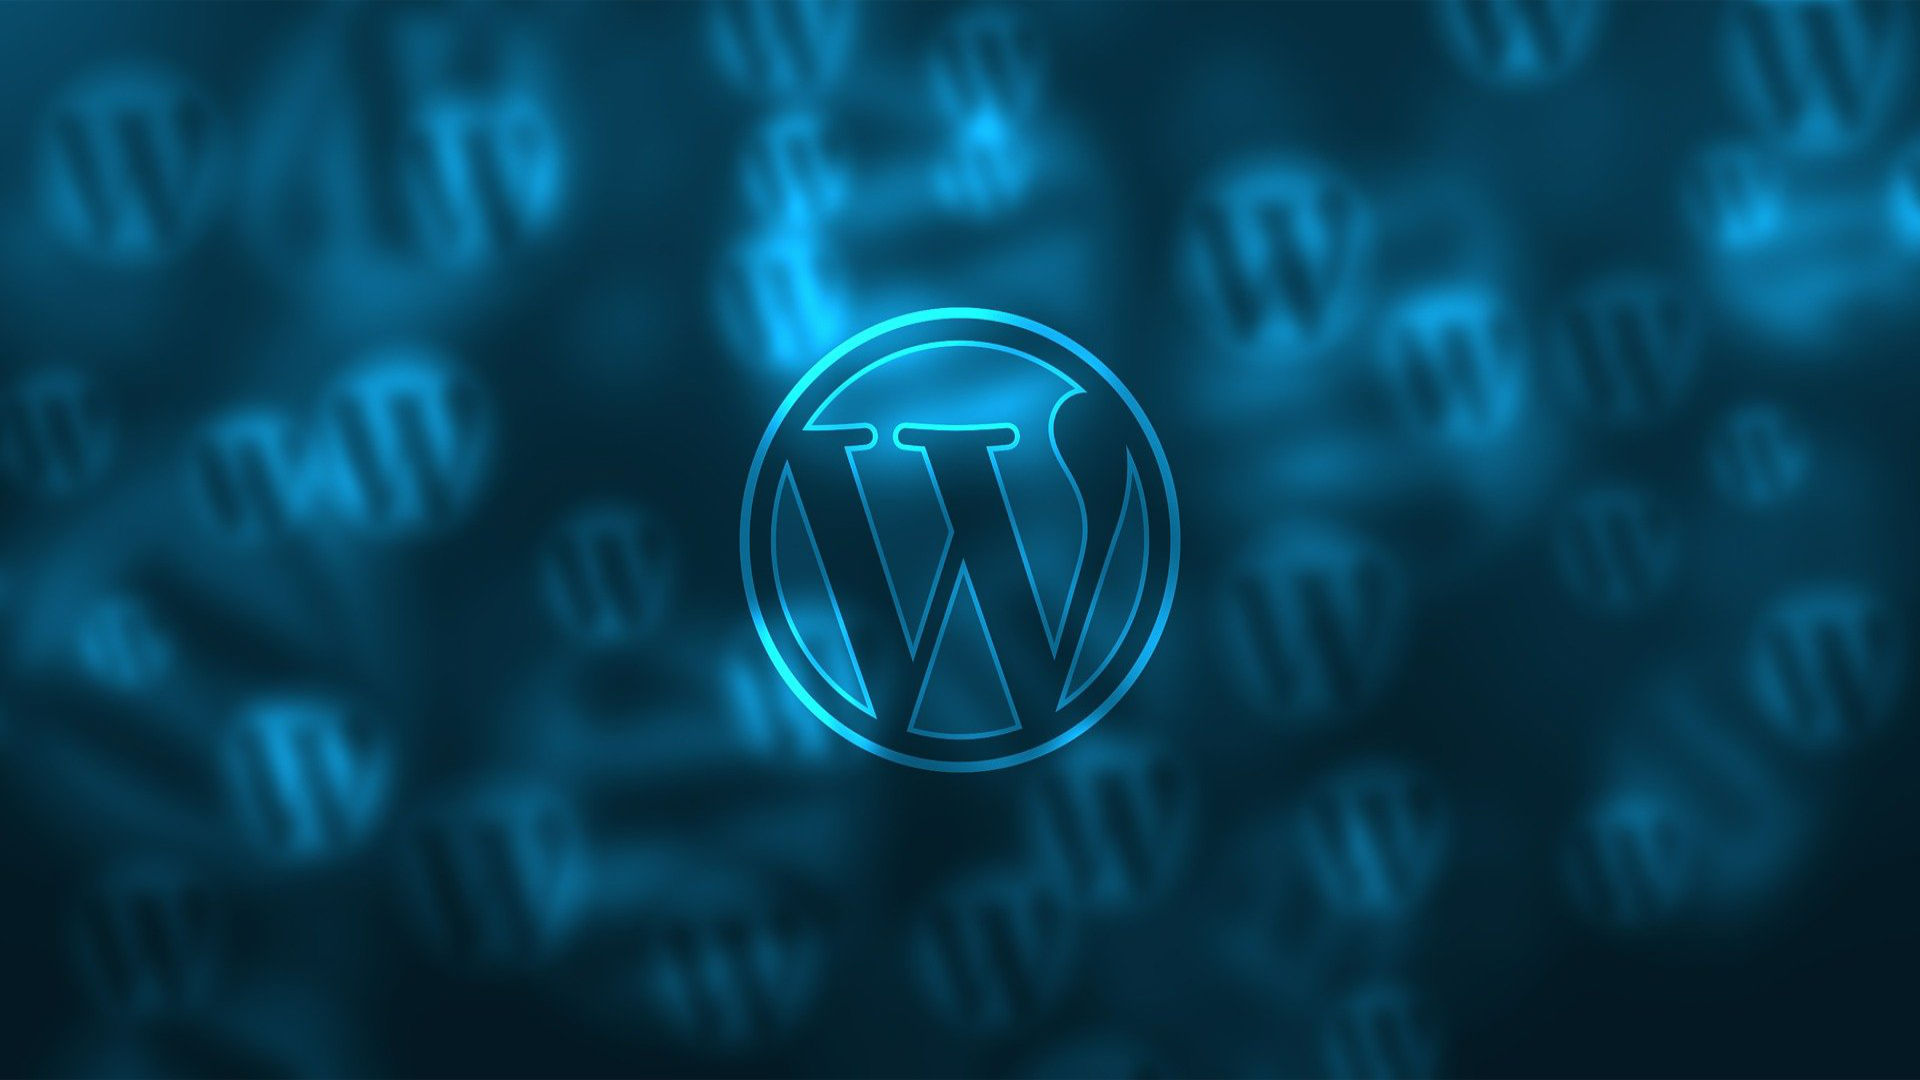 WordPress logo on blue background.